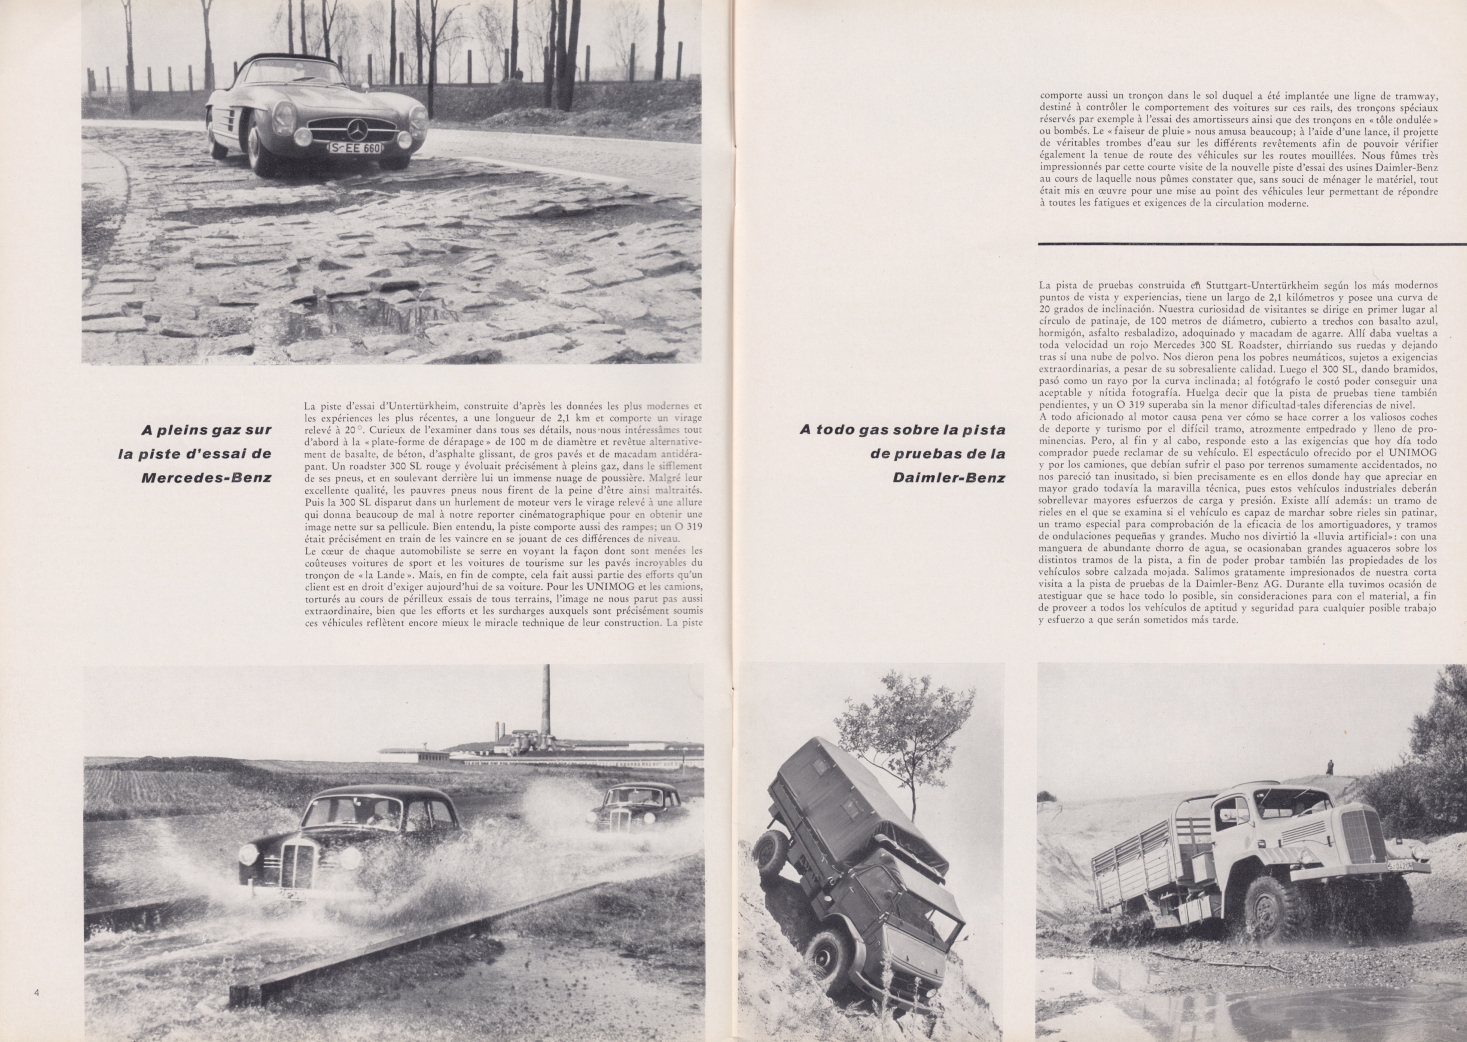 (REVISTA): Periódico In aller welt n.º 31 - Mercedes-Benz no mundo - 1959 - multilingue 003